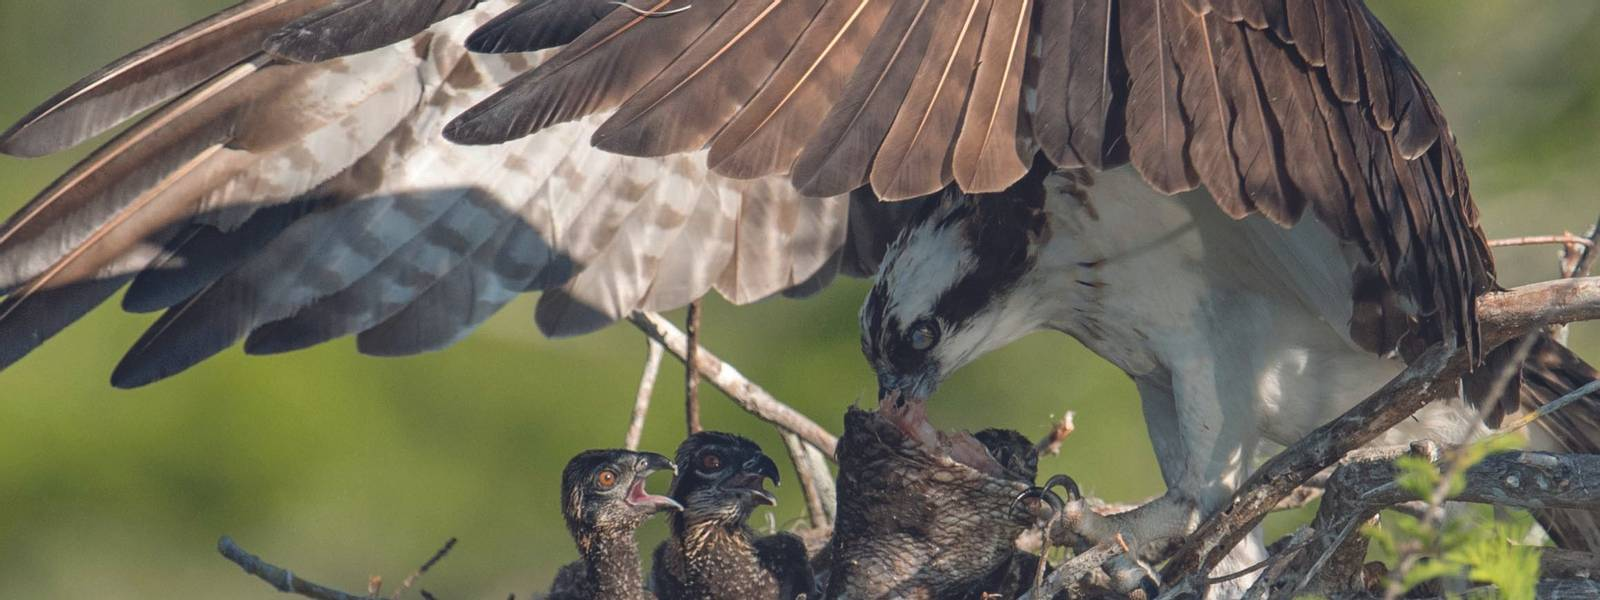 Wildlife - Explore Nature - AdobeStock_203852810 (1).jpeg